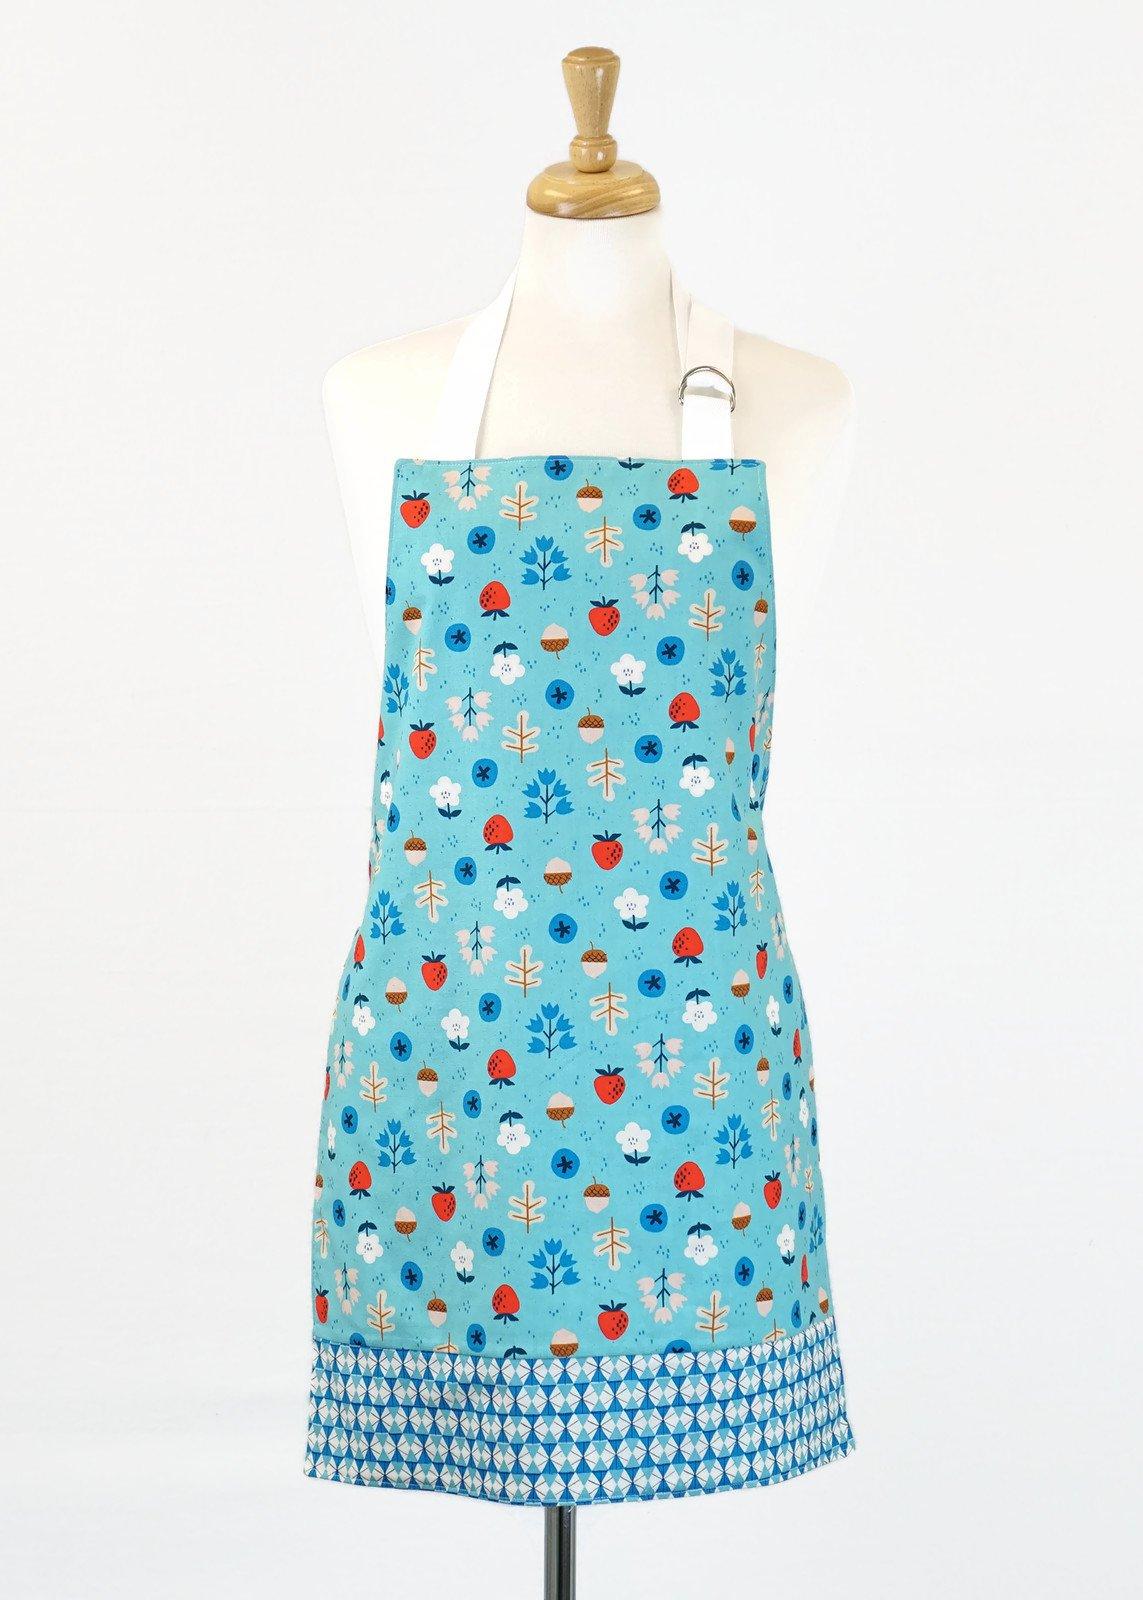 Women's Apron - Aqua with Acorns and Strawberries